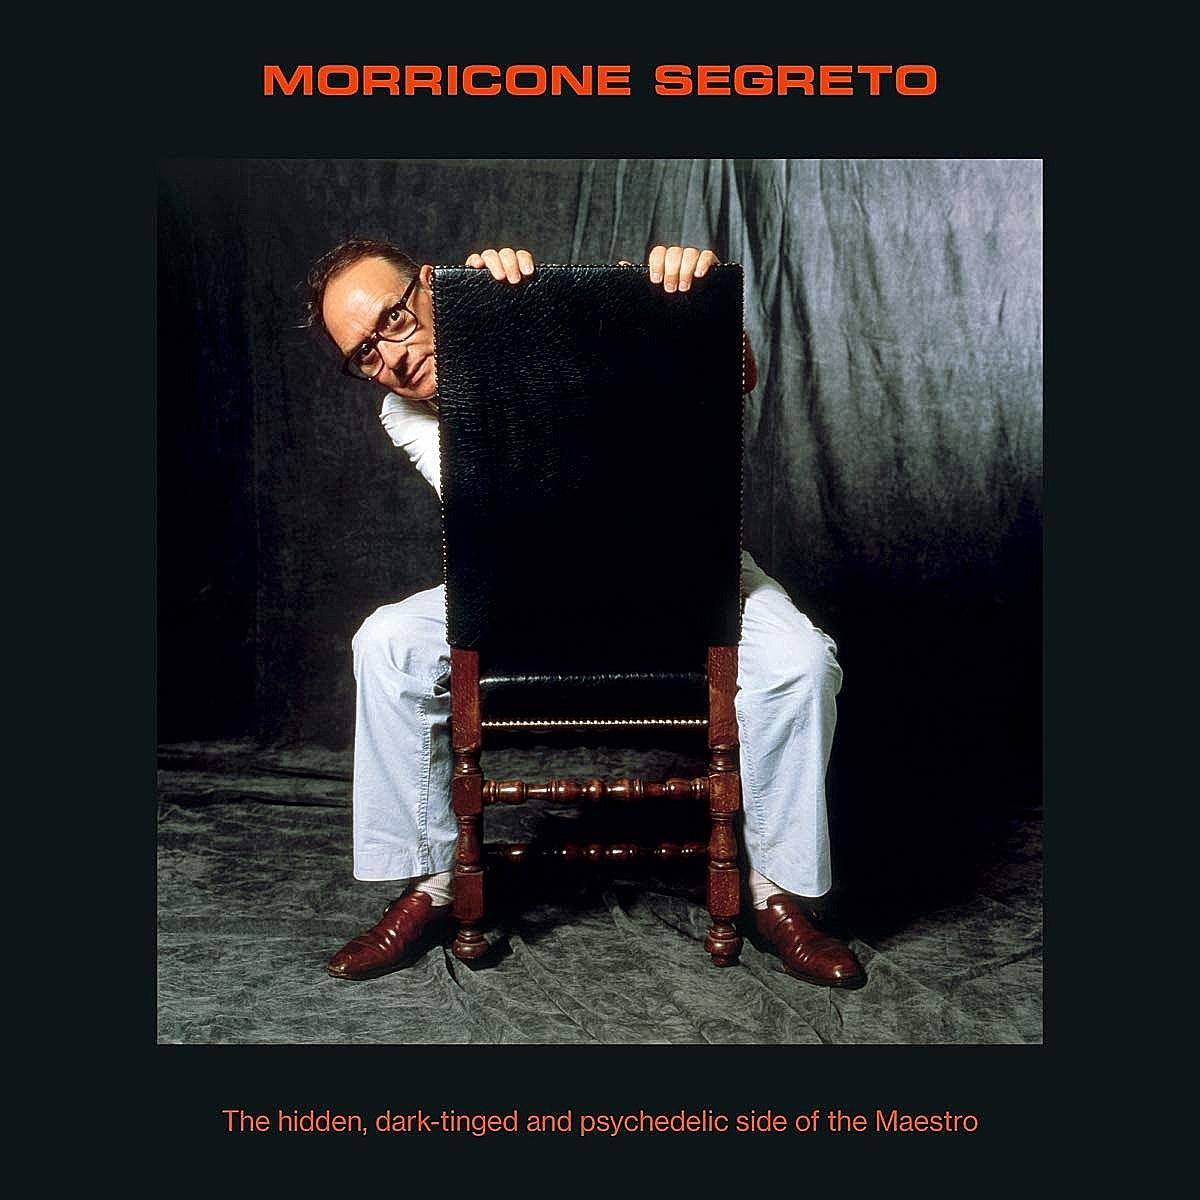 watch new Ennio Morricone documentary 'The Secrets Behind His Genius'